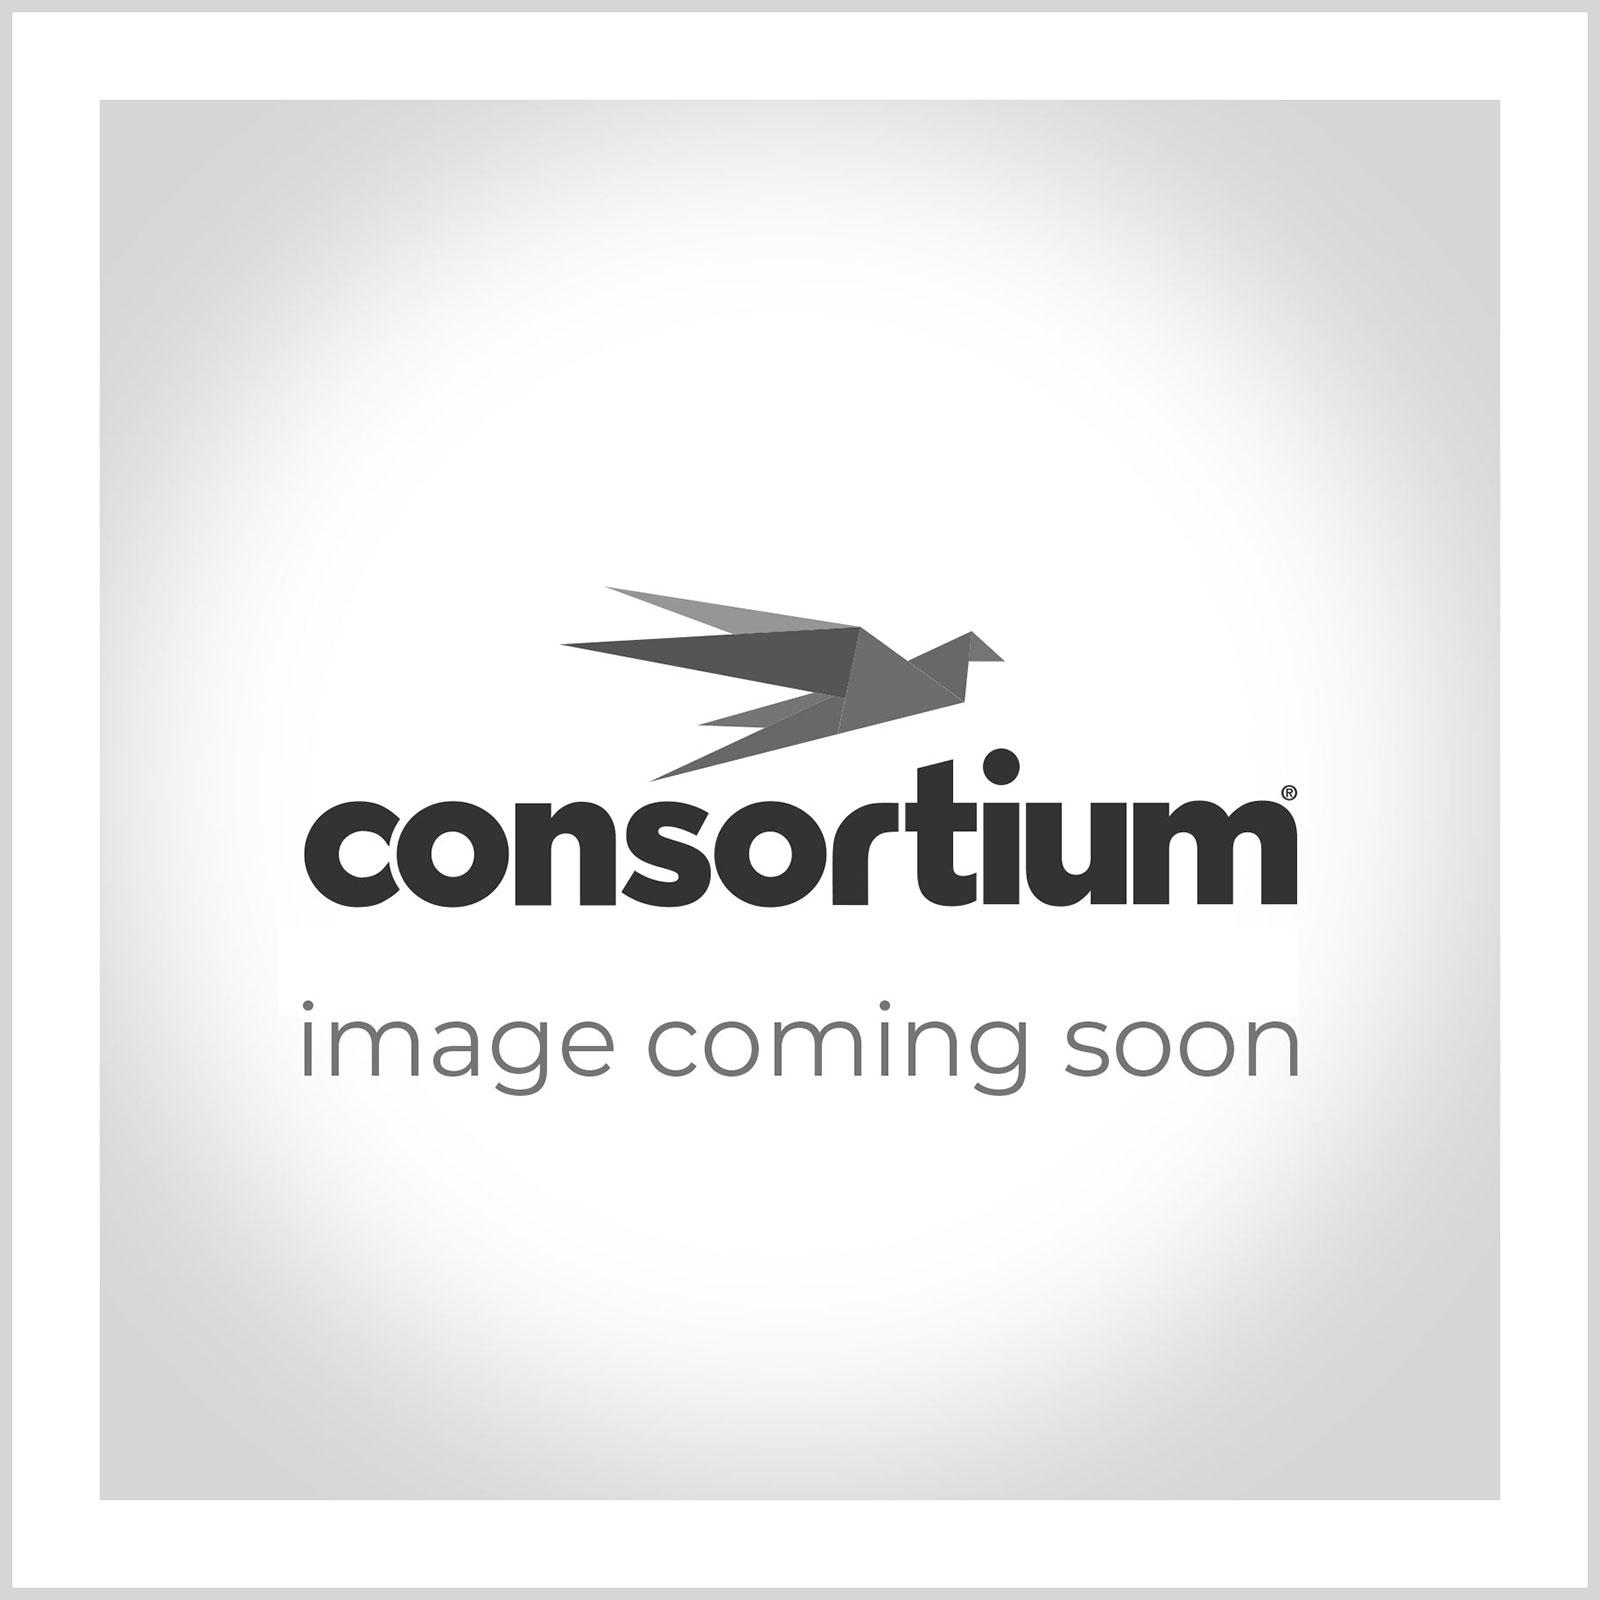 The Consortium Multi-Coloured Paper Clips